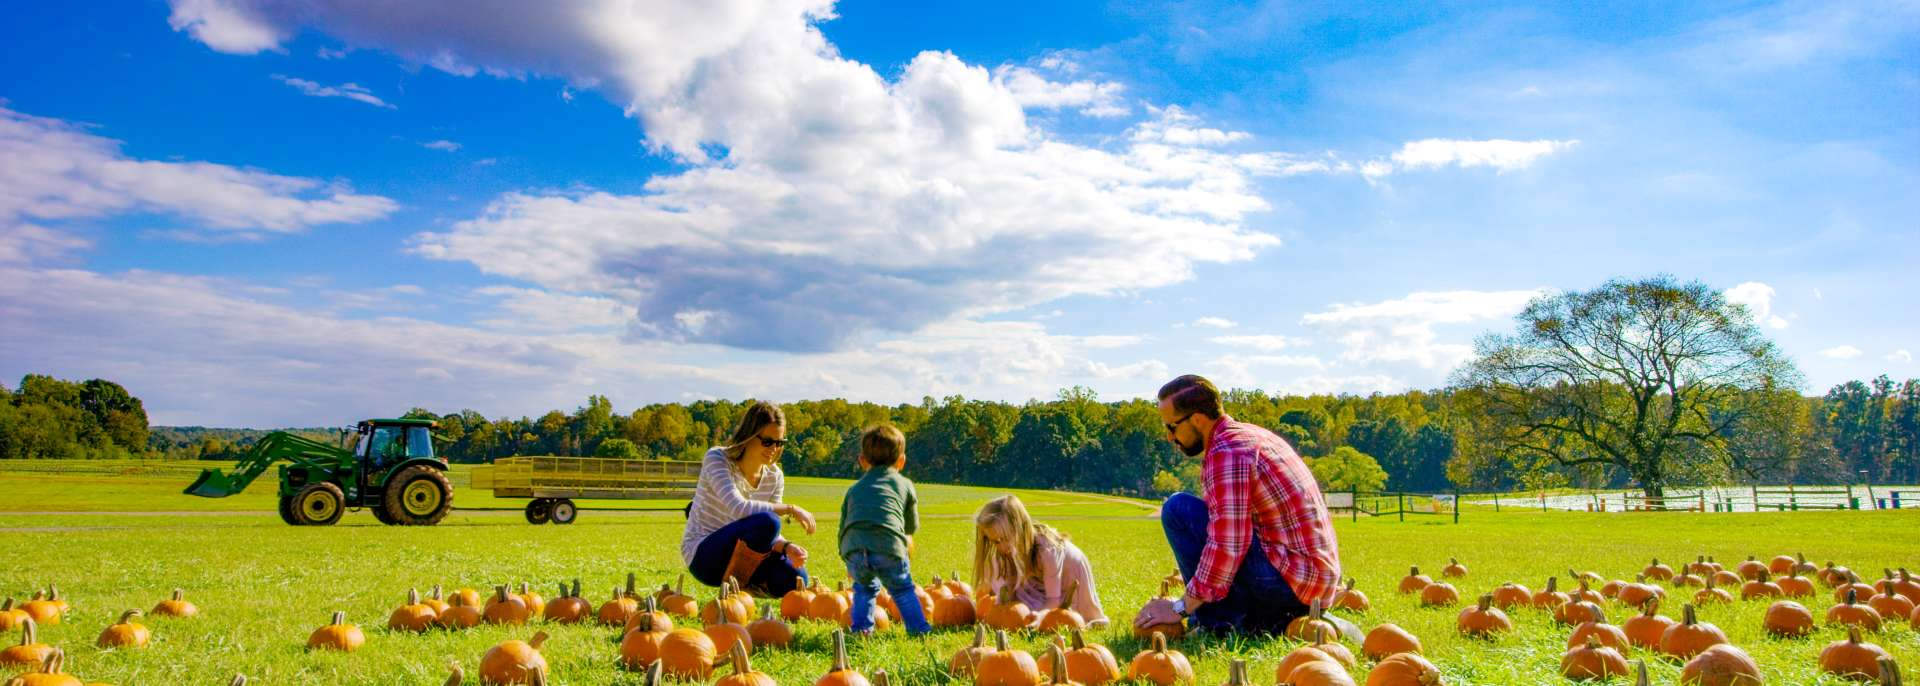 Fall in Rowan County